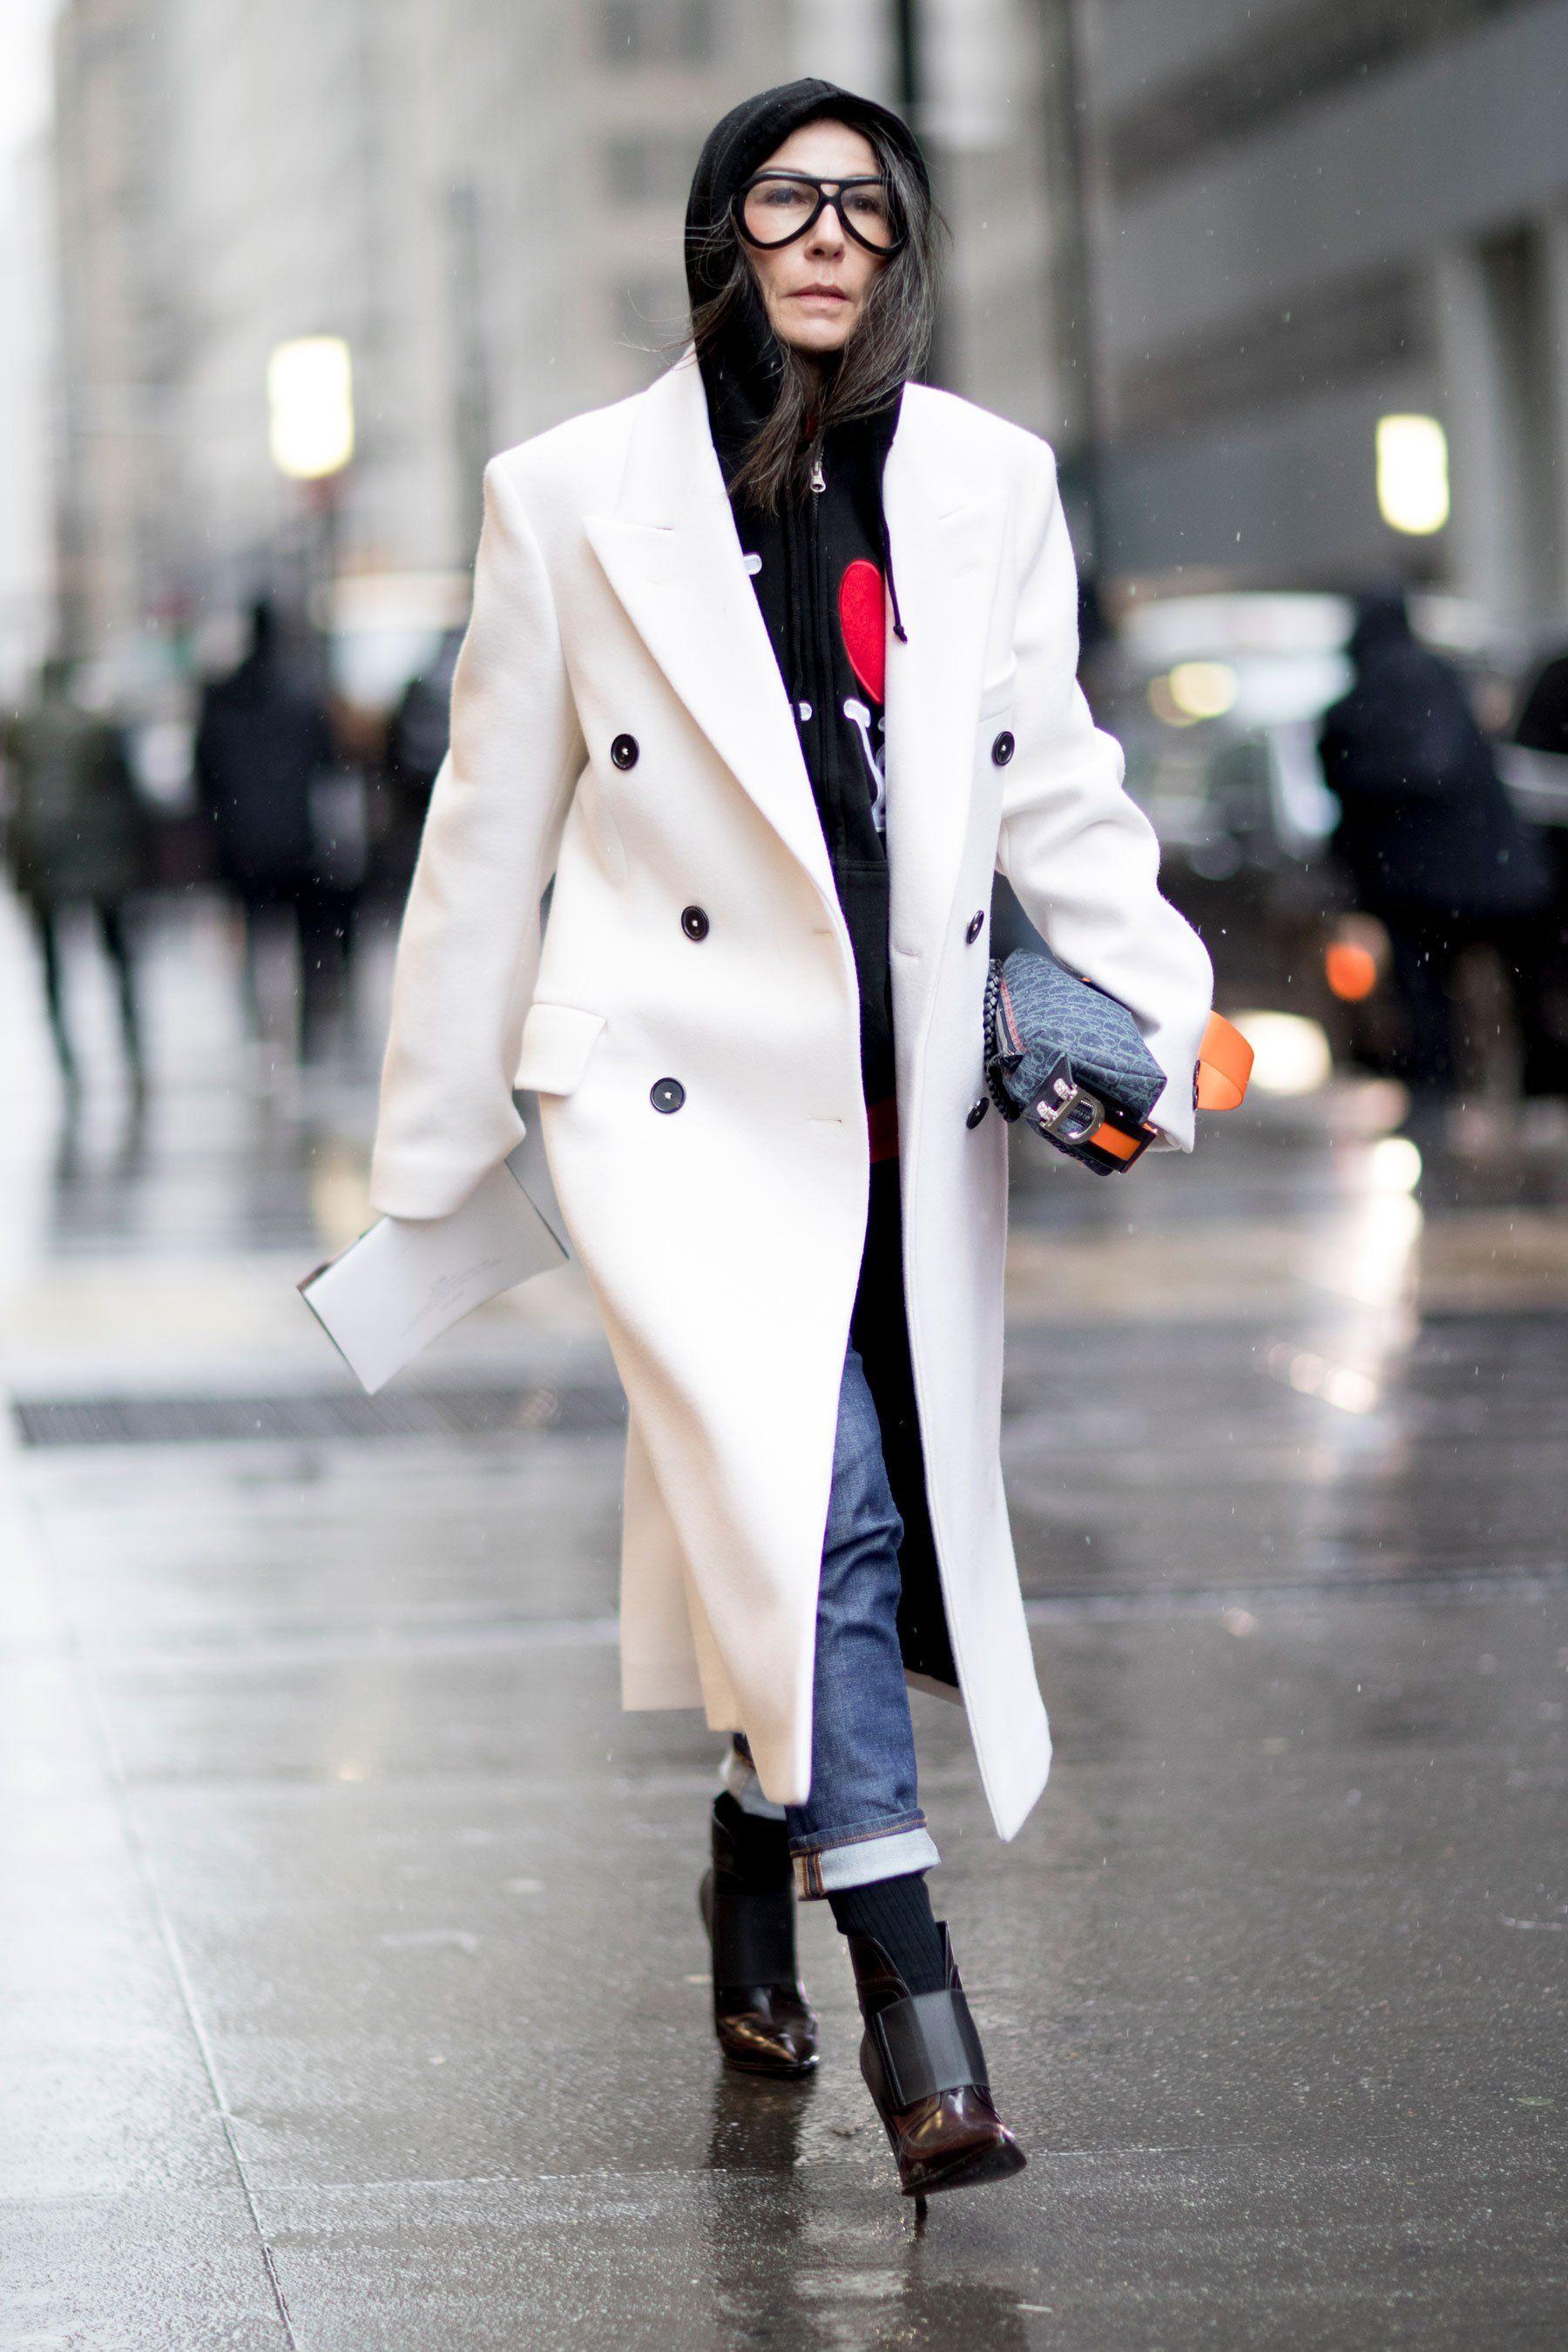 Manteau blanc a capuche femme